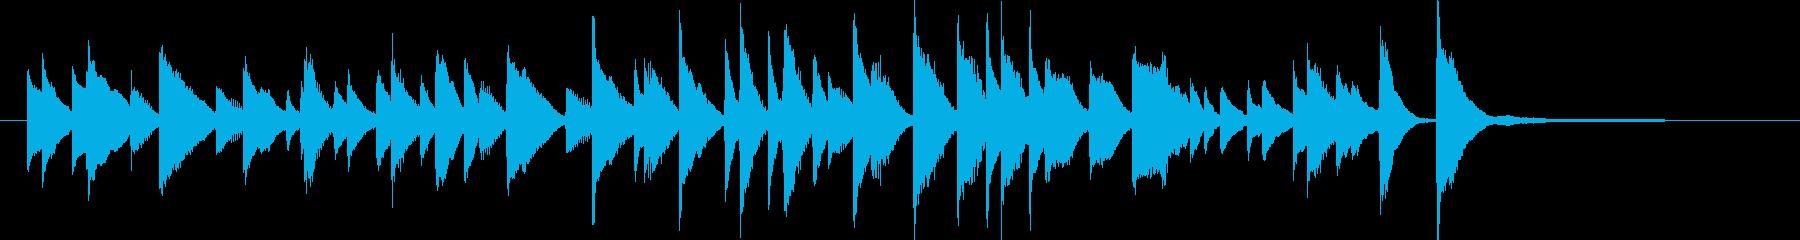 CM15秒、明るく軽快なジャズピアノソロの再生済みの波形